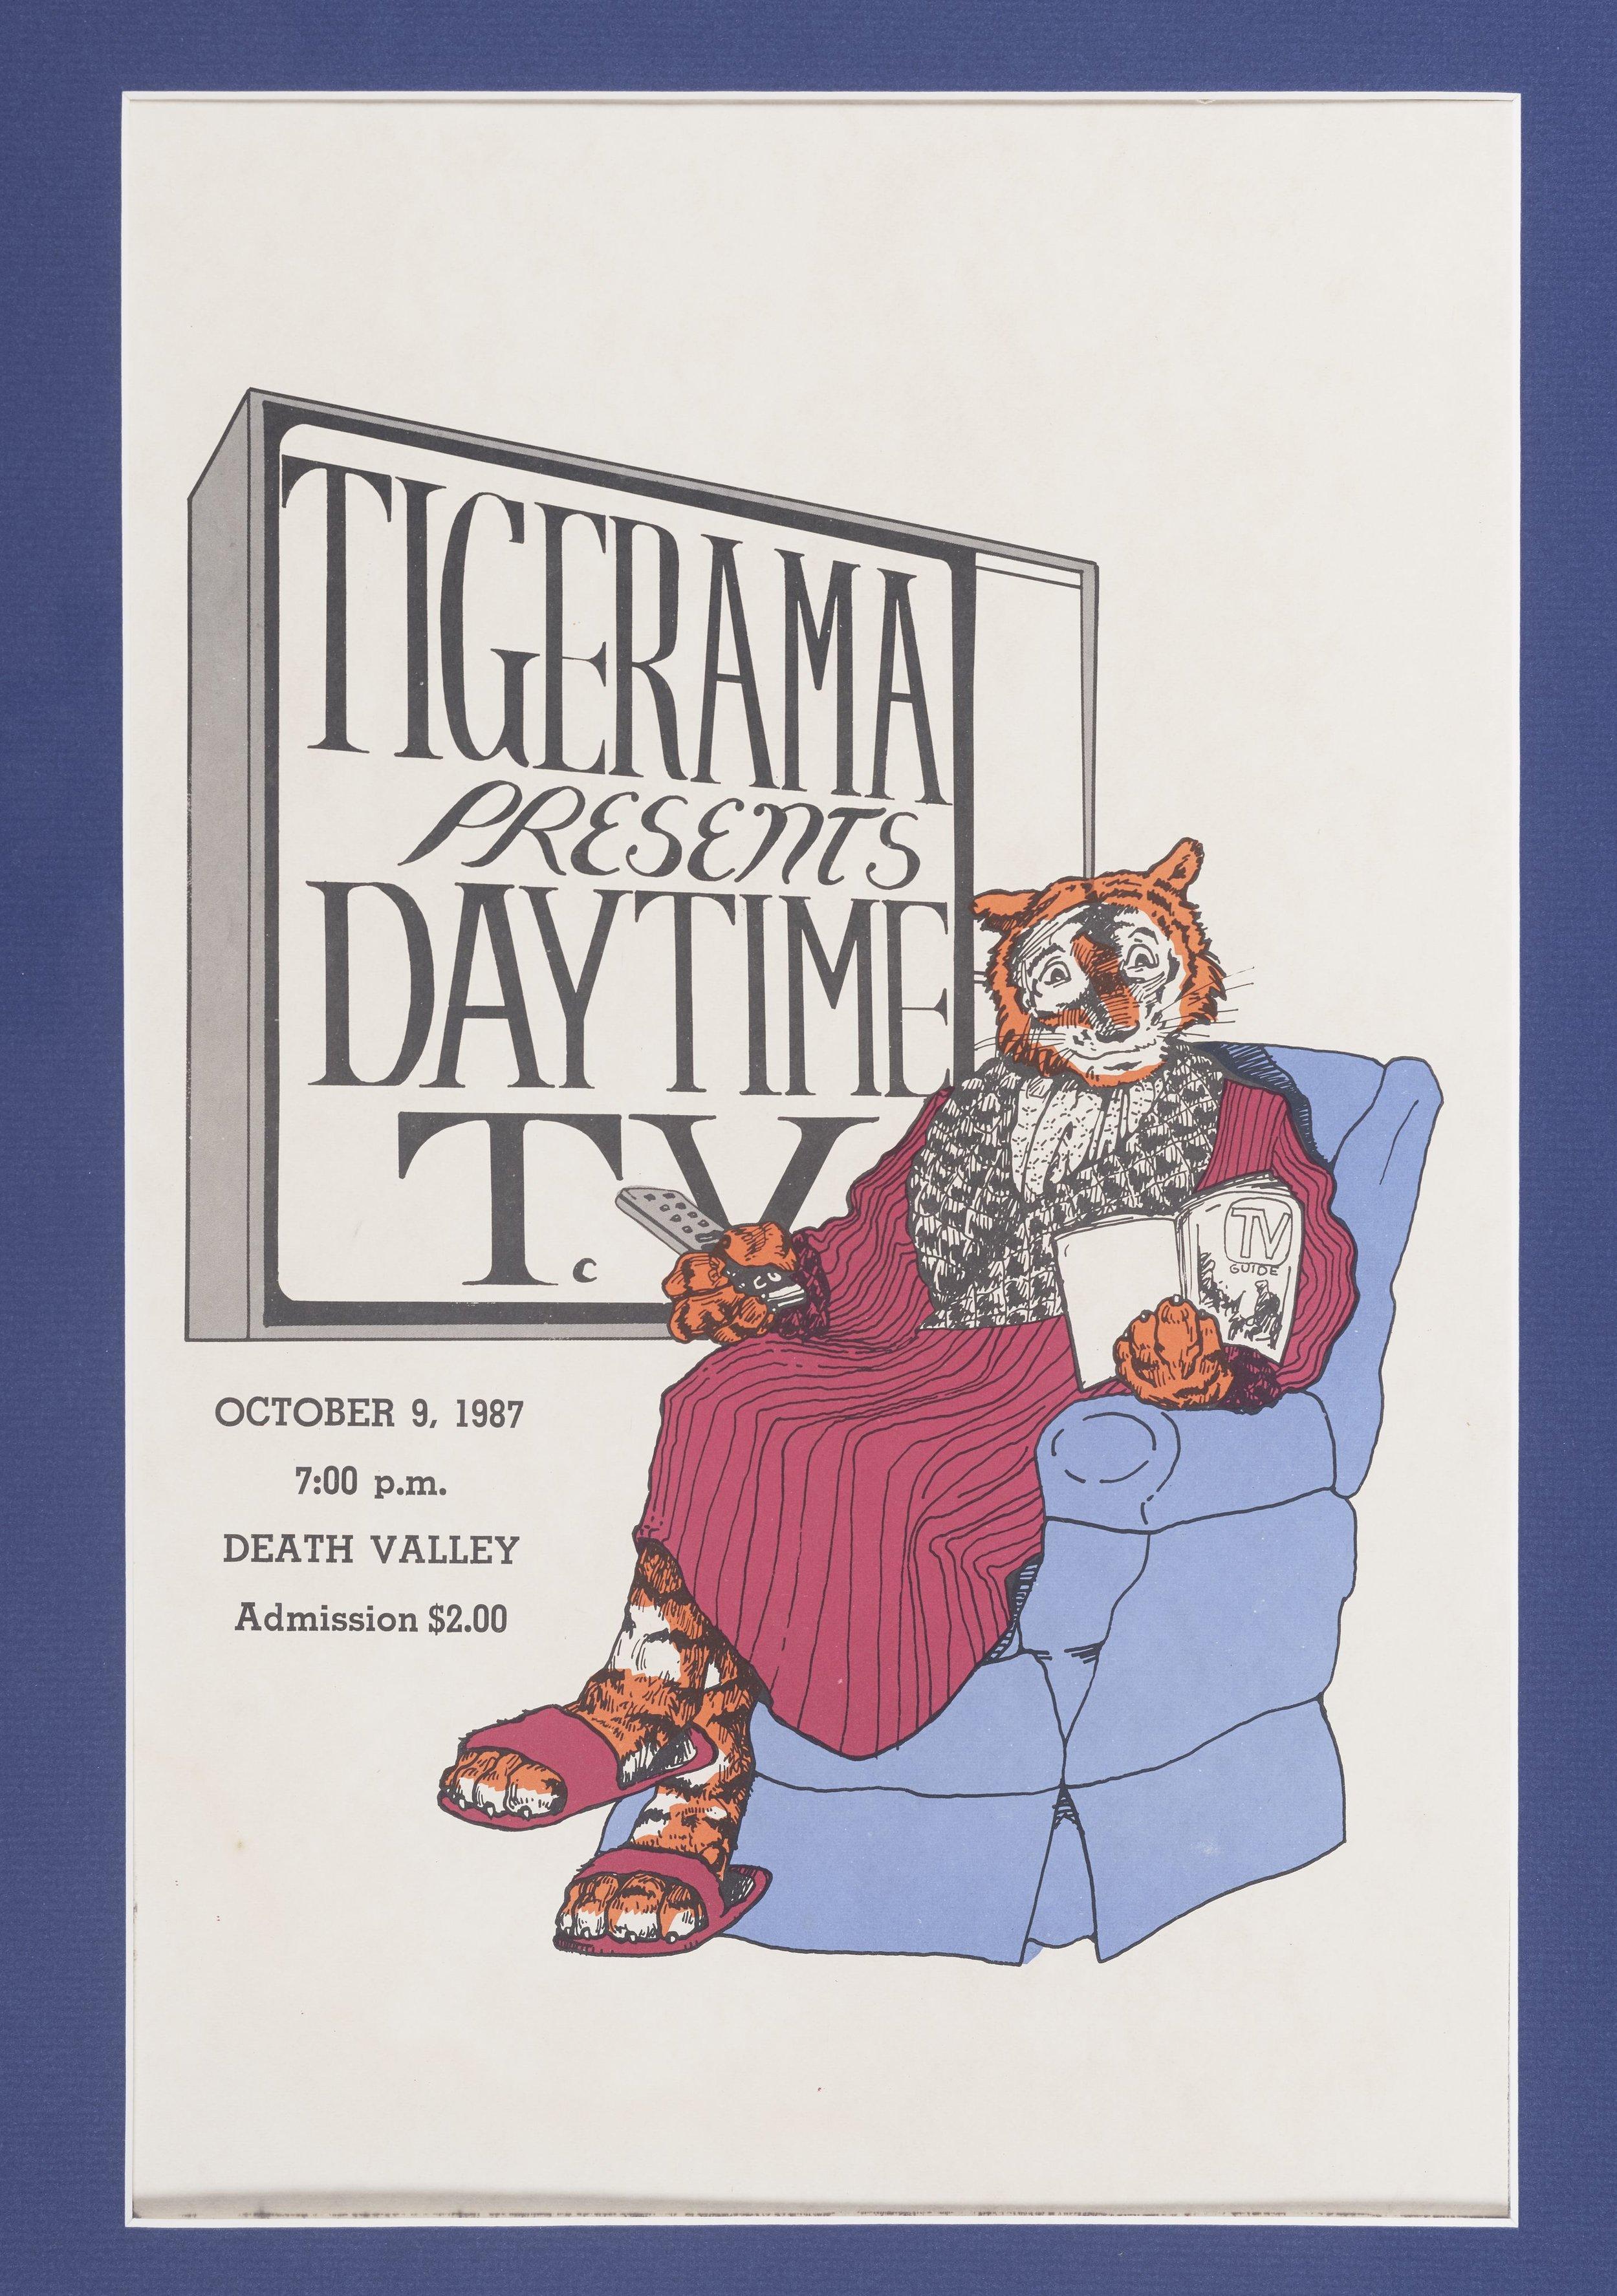 Tigerama 1987